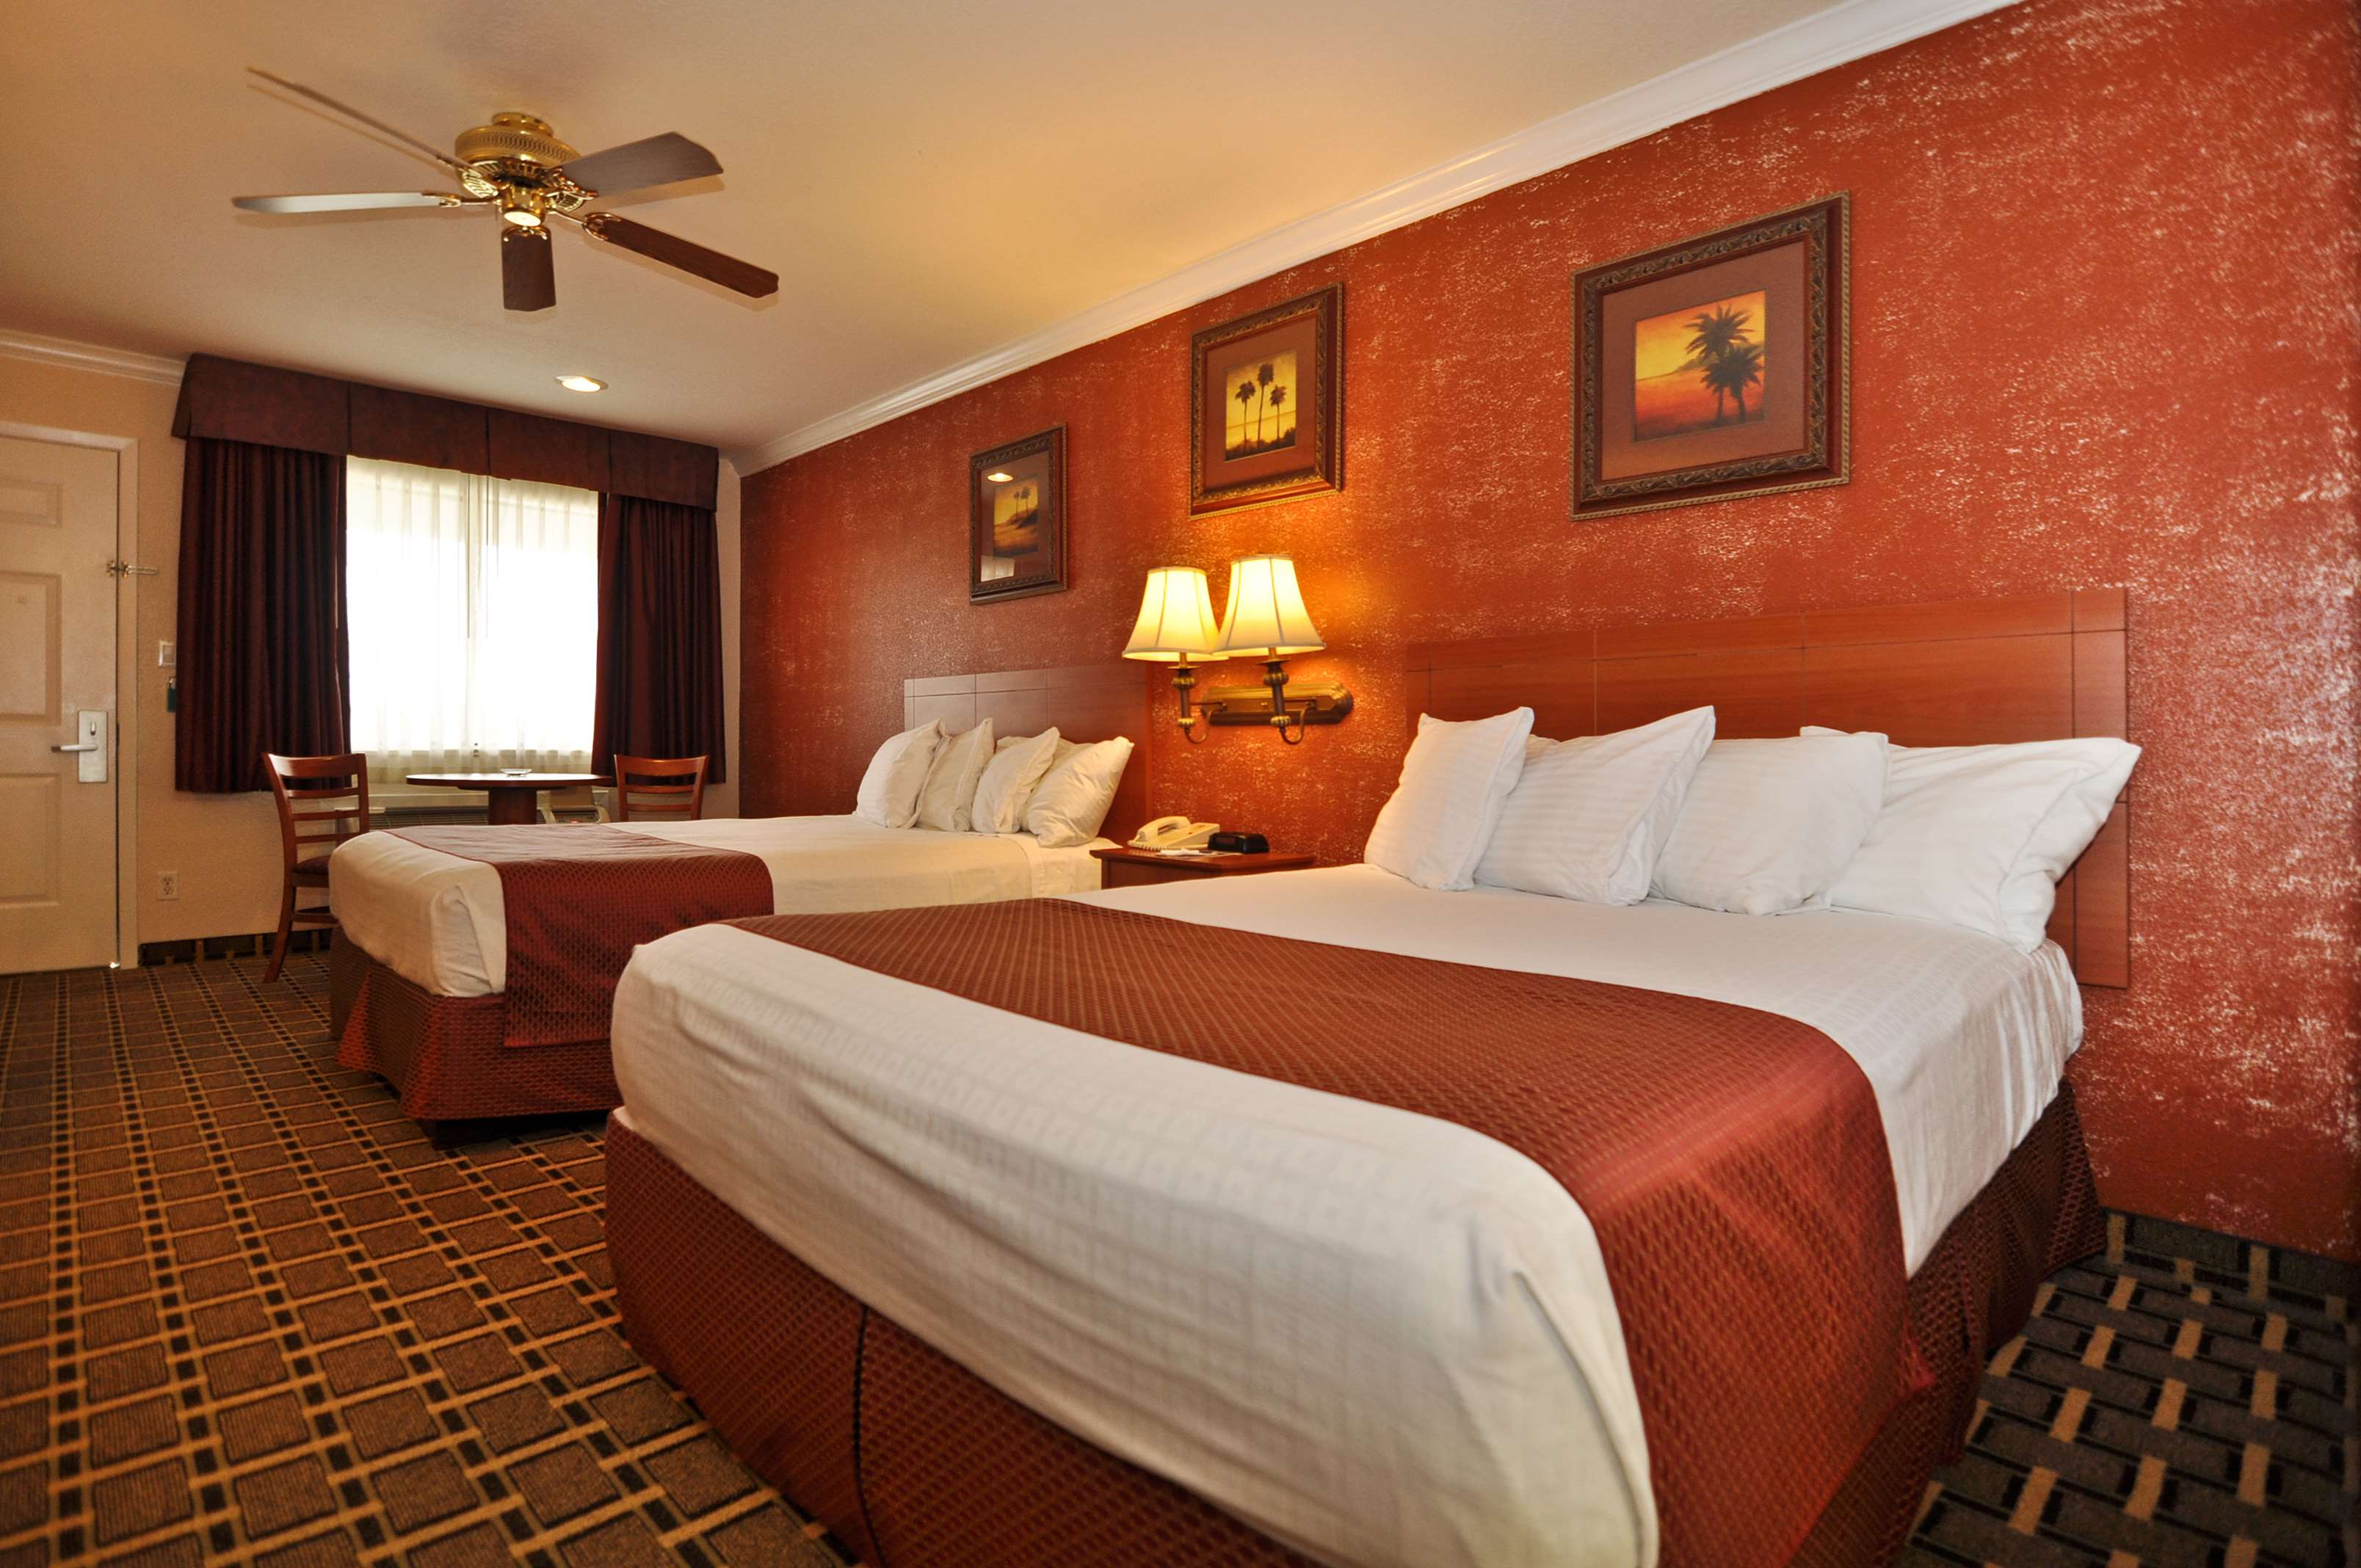 Best Western Pearland Inn image 9